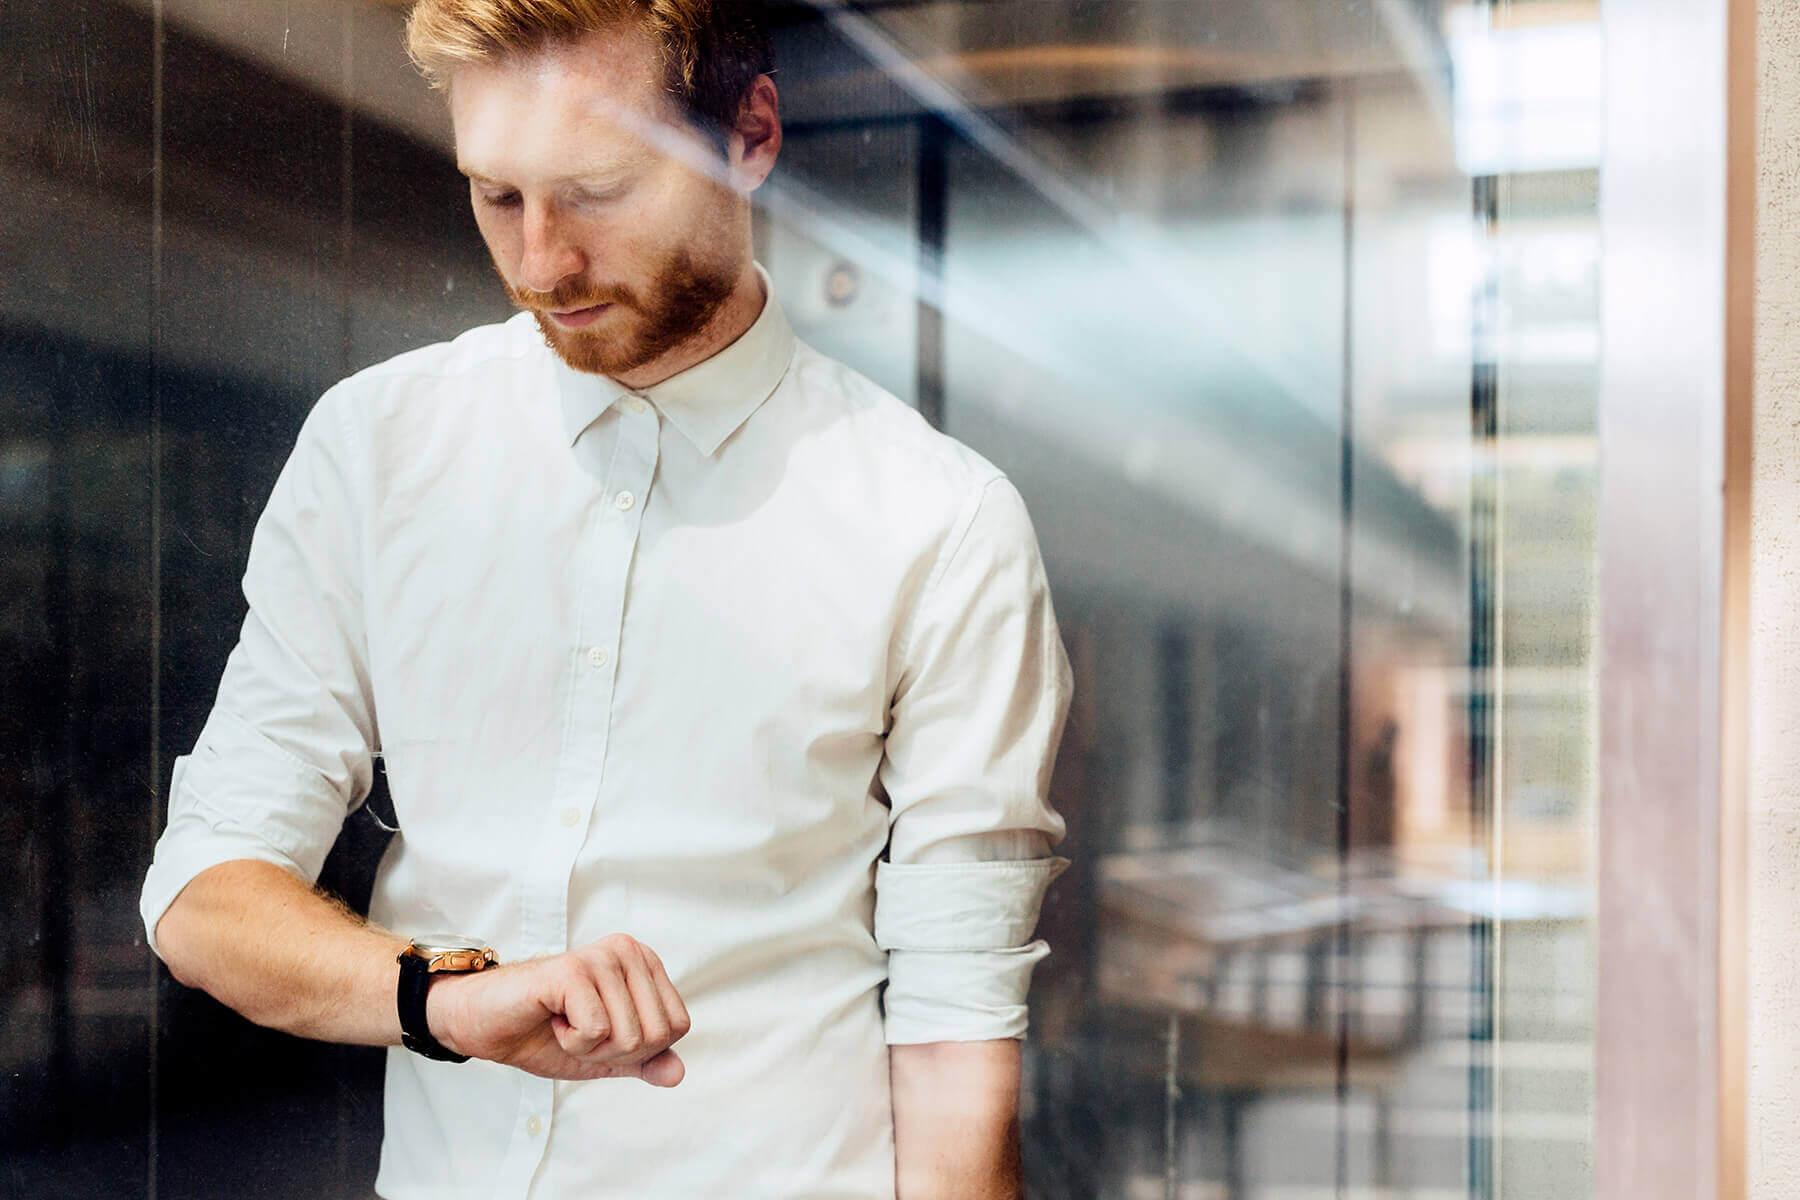 redhead watch tablet